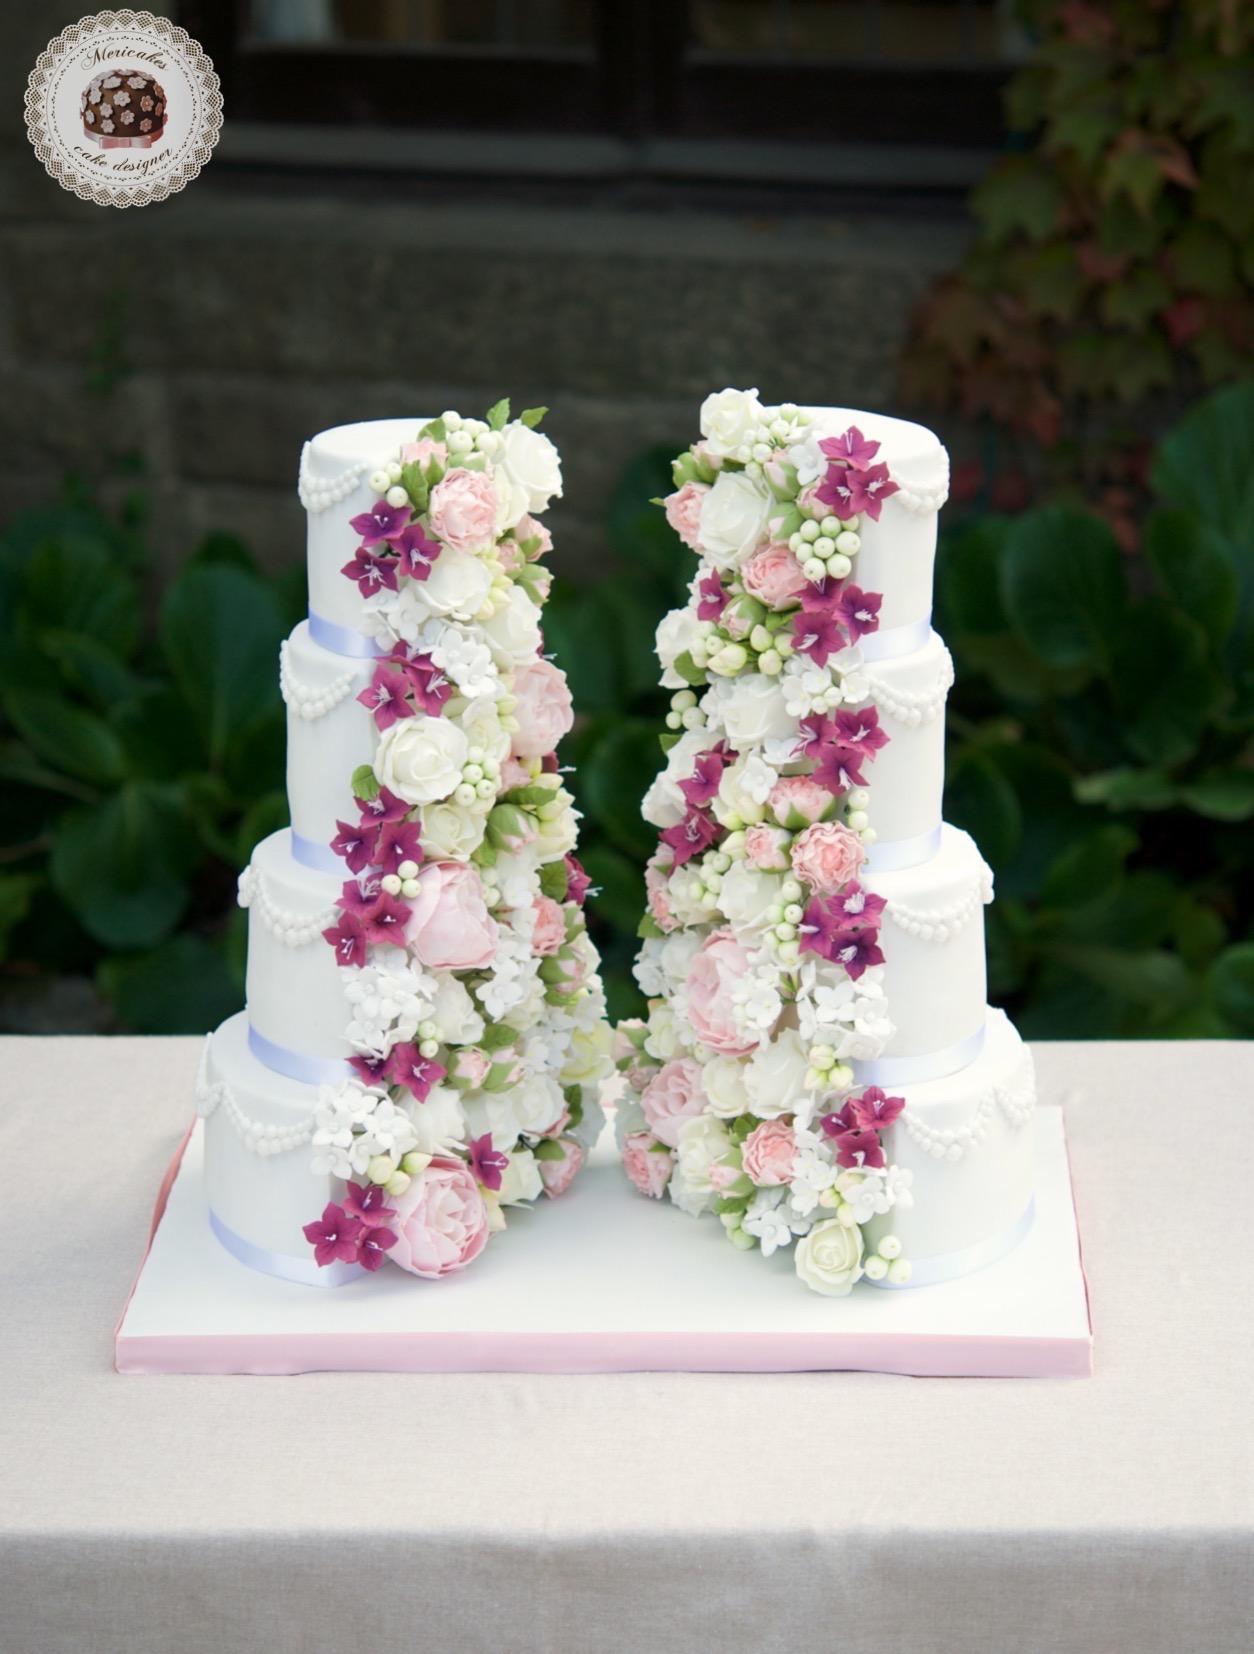 Half and half cake, wedding cake, luxury wedding cakes, mericakes, barcelona, sugarflowers, flores de azucar, la baronia, cake artist, vegan cake, tarta vegana, red velvet, vegan 1